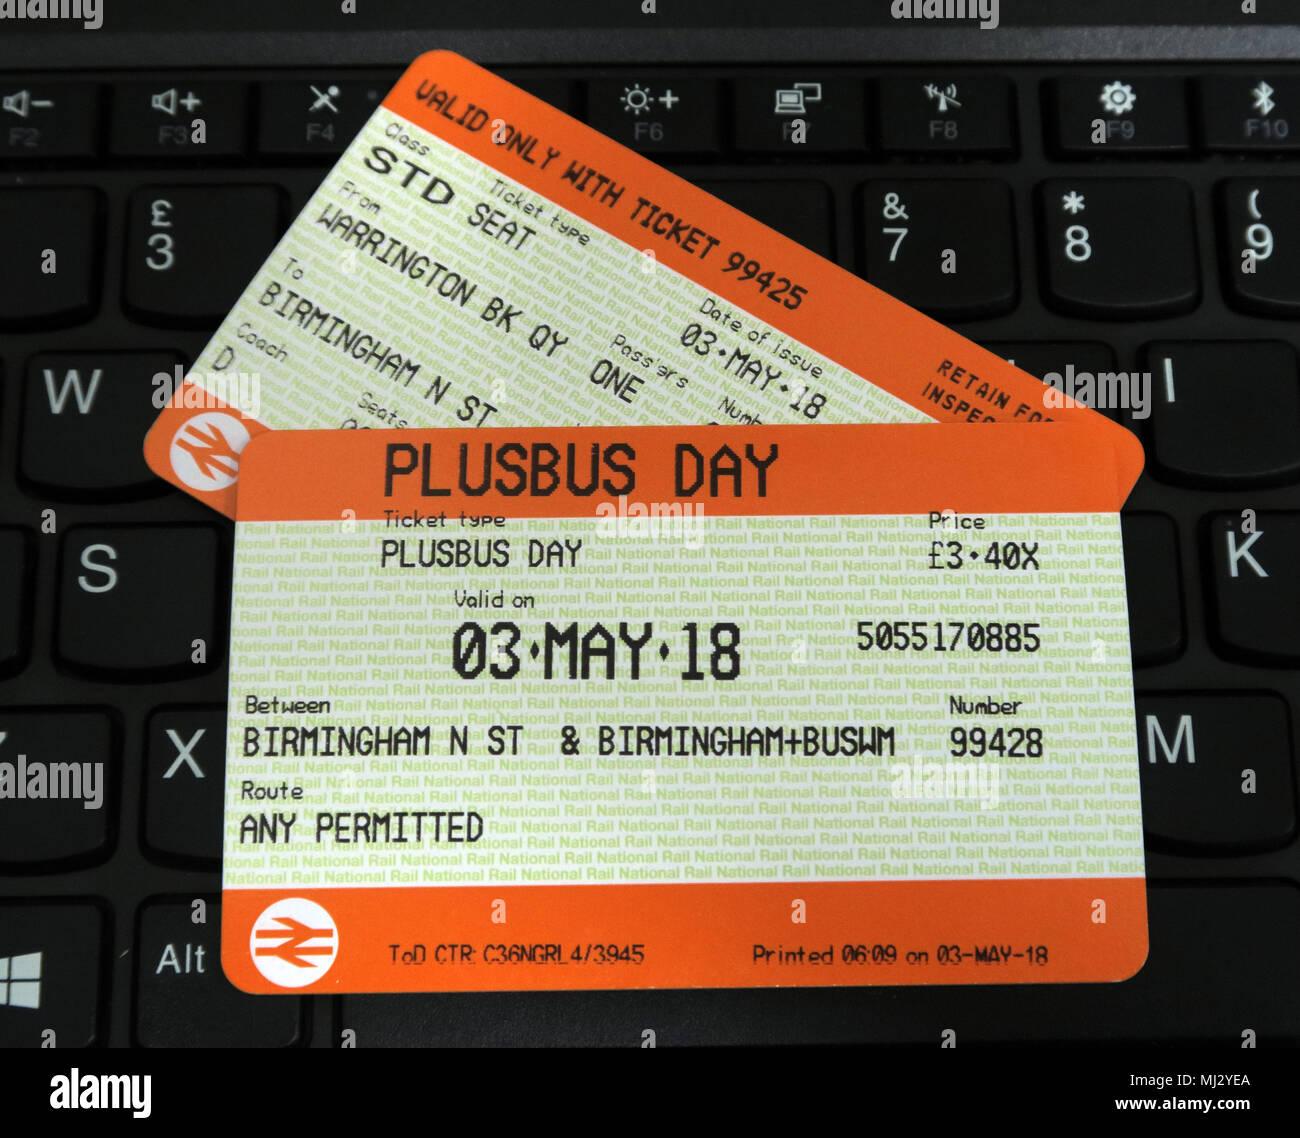 railway,rail,travel,bus travel,integrated,transport,for,Birmingham,city,centre,city centre,on,WM,WM travel,west midlands travel,UK,United Kingdom,Network,Rail,Network Rail,One,One ticket,any permitted,discount,cheap,GB,UNITED KINGDOM,Great Britain,British,Day,Plusbusday,BusWM,Birmingham+busWM,Discount,price,Discount Price,freedom,services,no restrictions,GoTonySmith